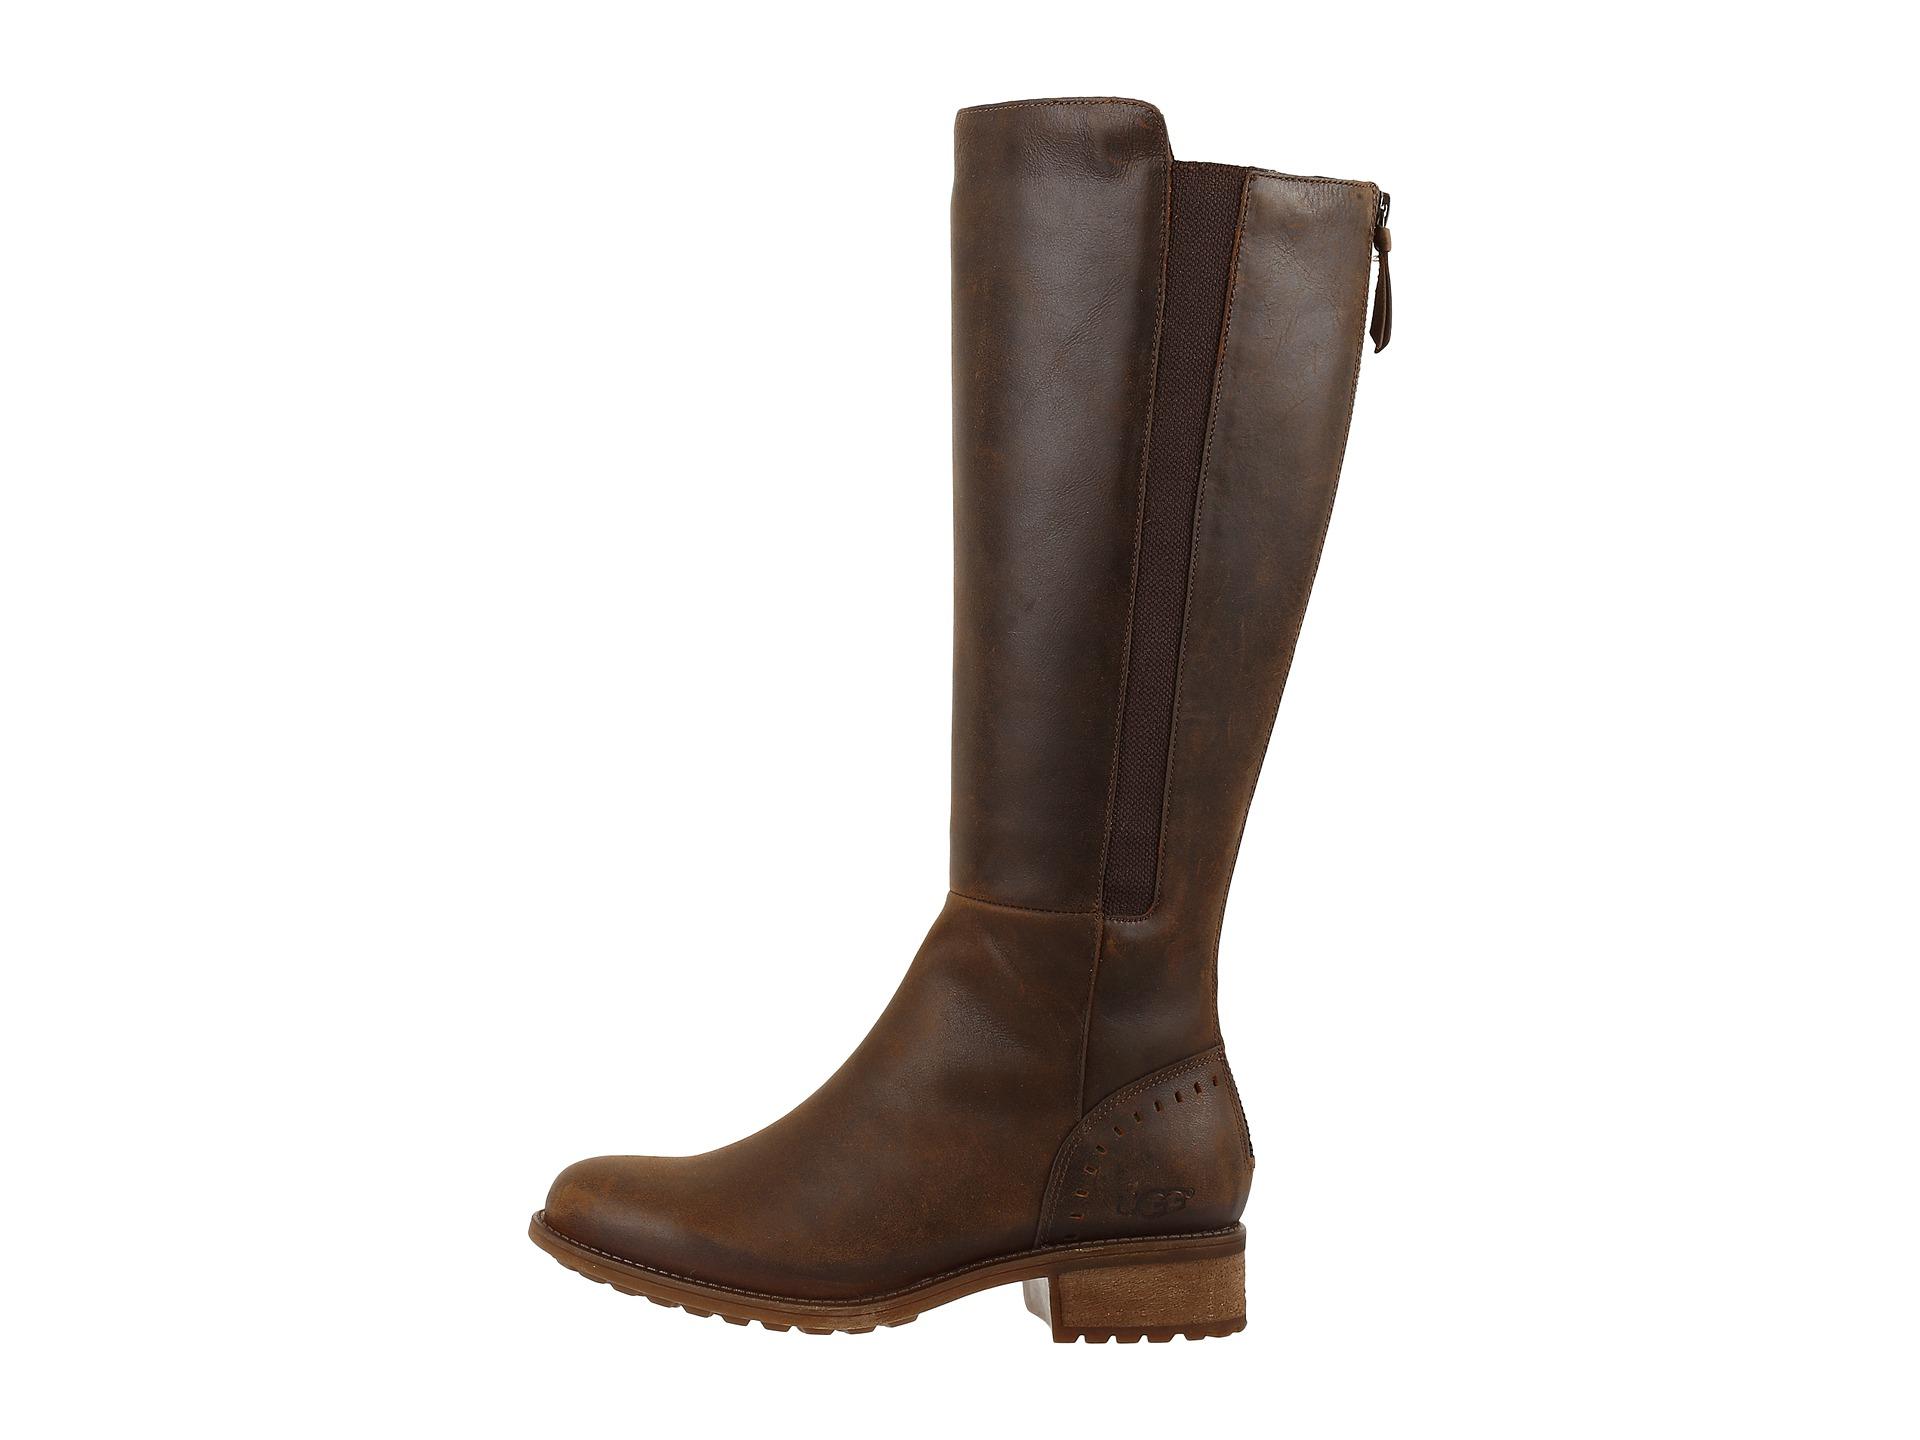 acb2c4d556d Knee High Ugg Boots Ebay